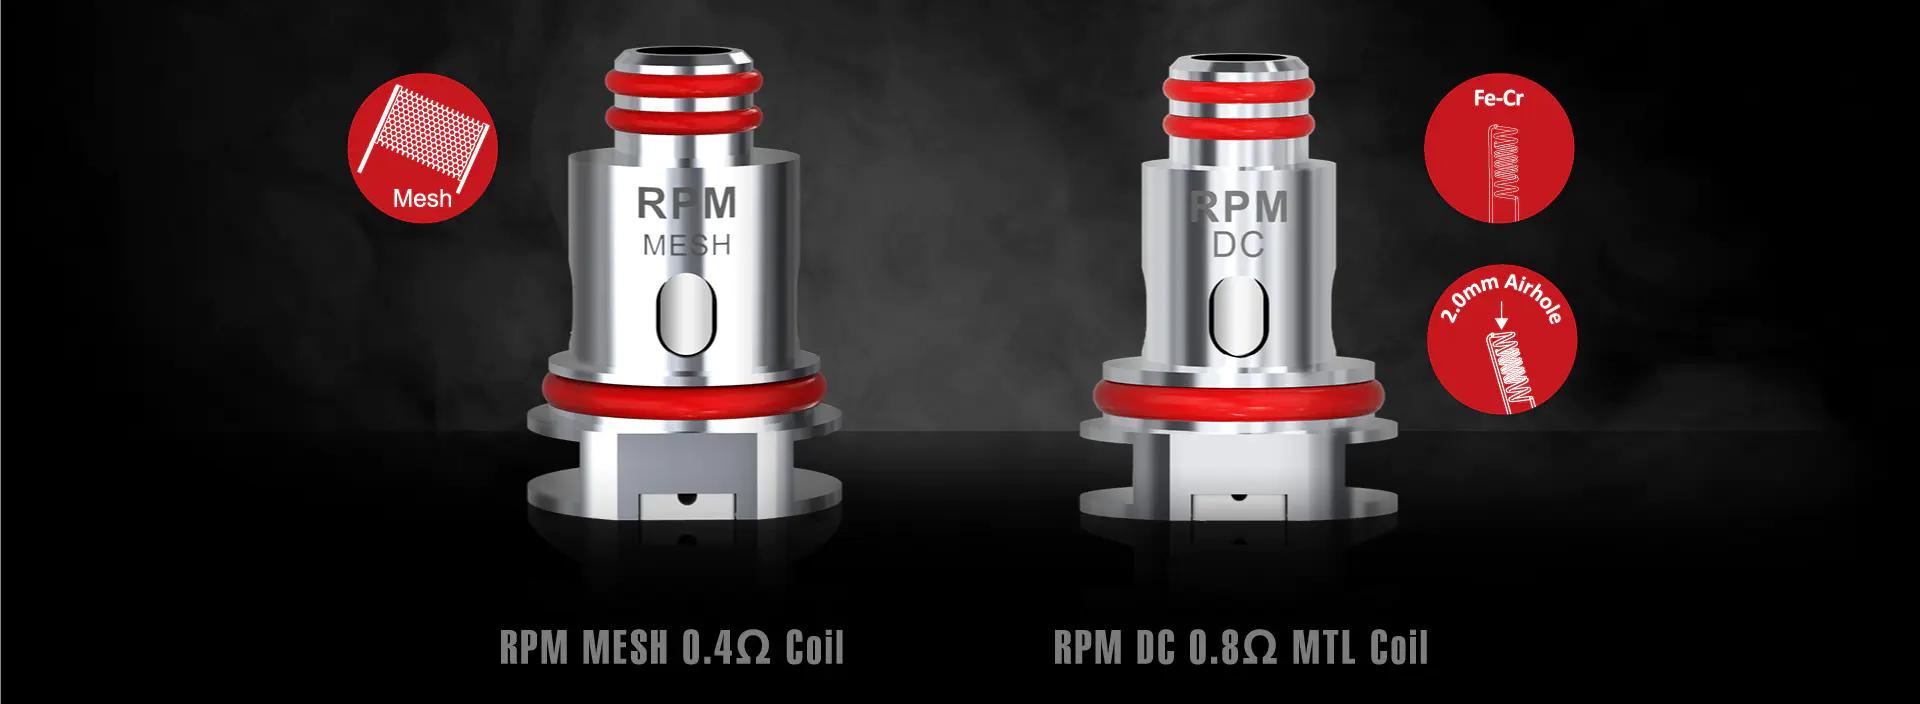 Vape RPM Lite 40W 1250mAh Starter Kit - Smok